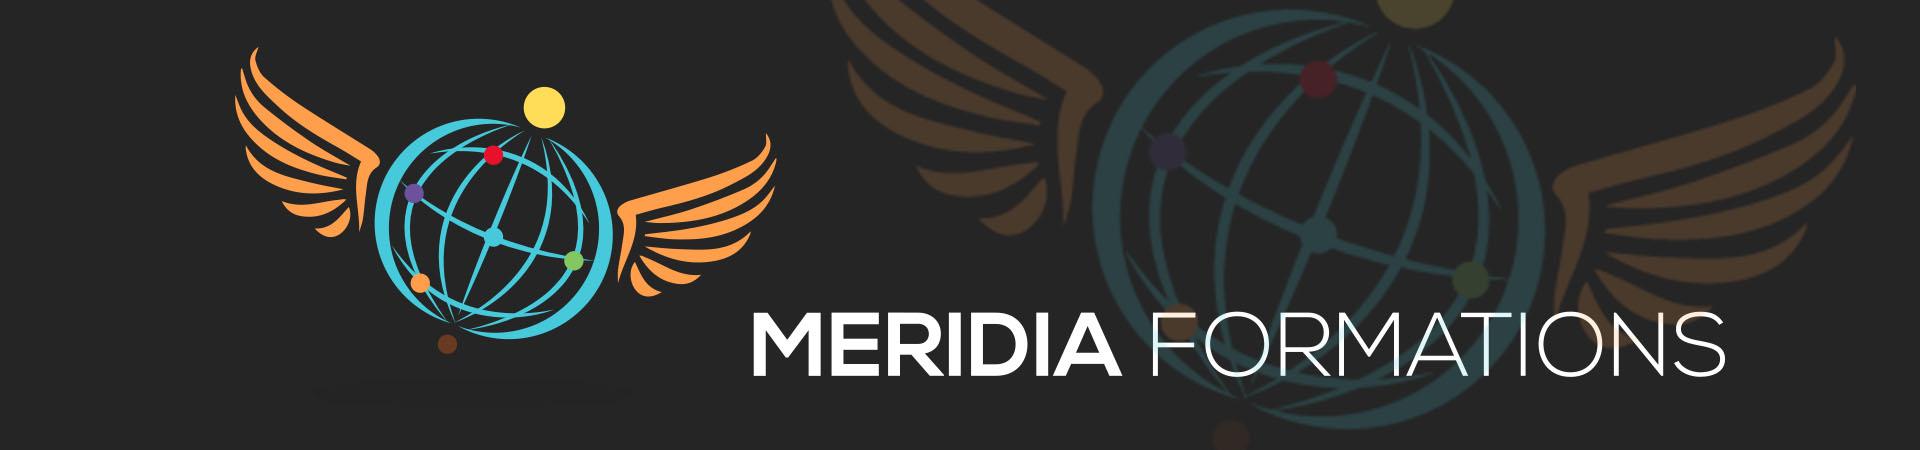 meridia-formation-formateur-sur-mesure-formation-grenoble